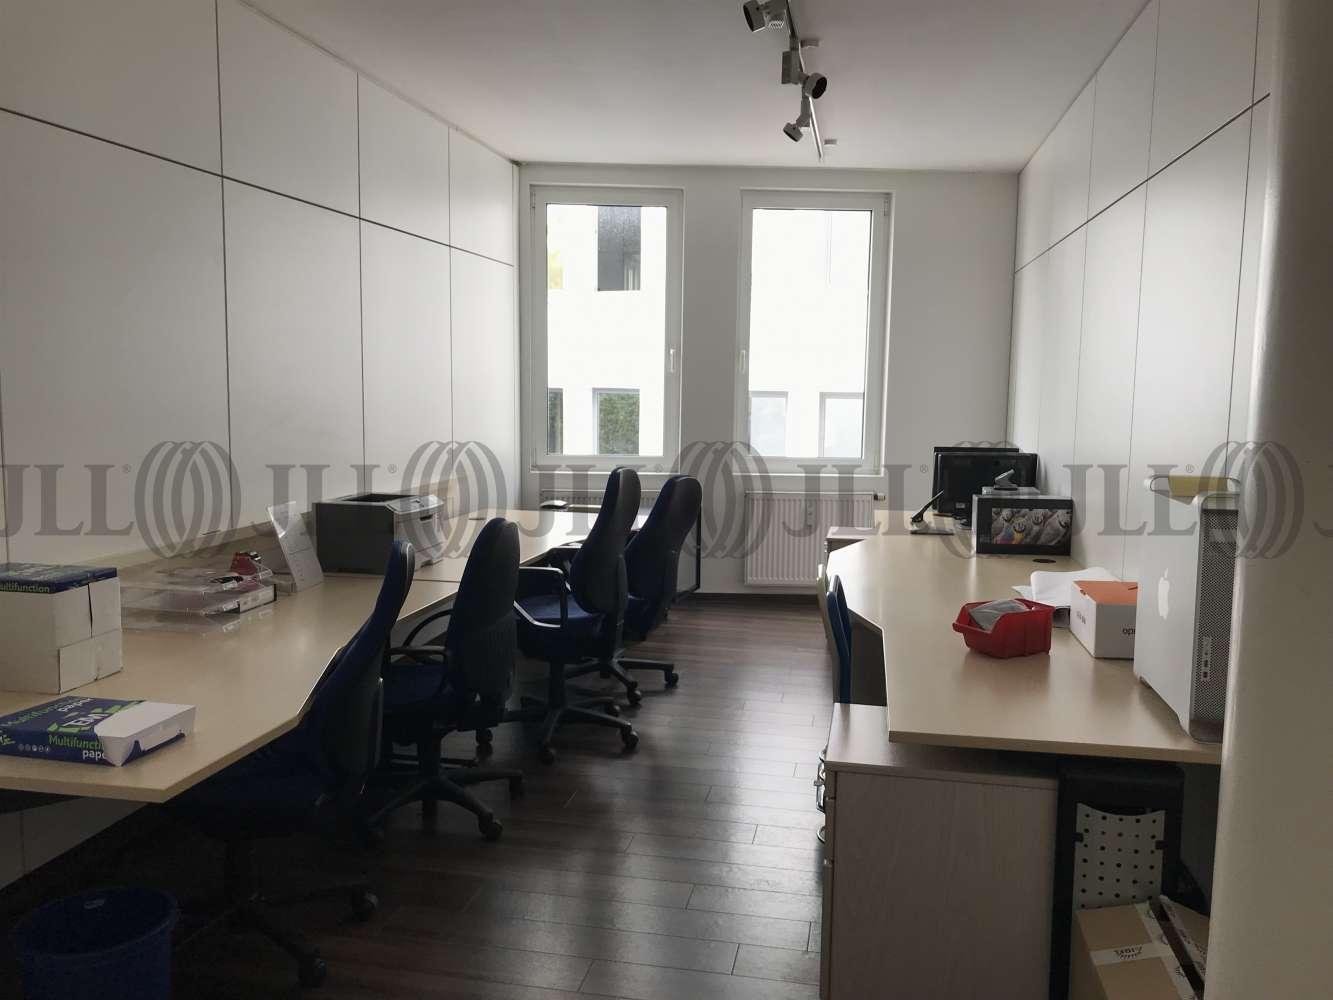 Büros Leinfelden-echterdingen, 70771 - Büro - Leinfelden-Echterdingen, Echterdingen - S0197 - 10629315